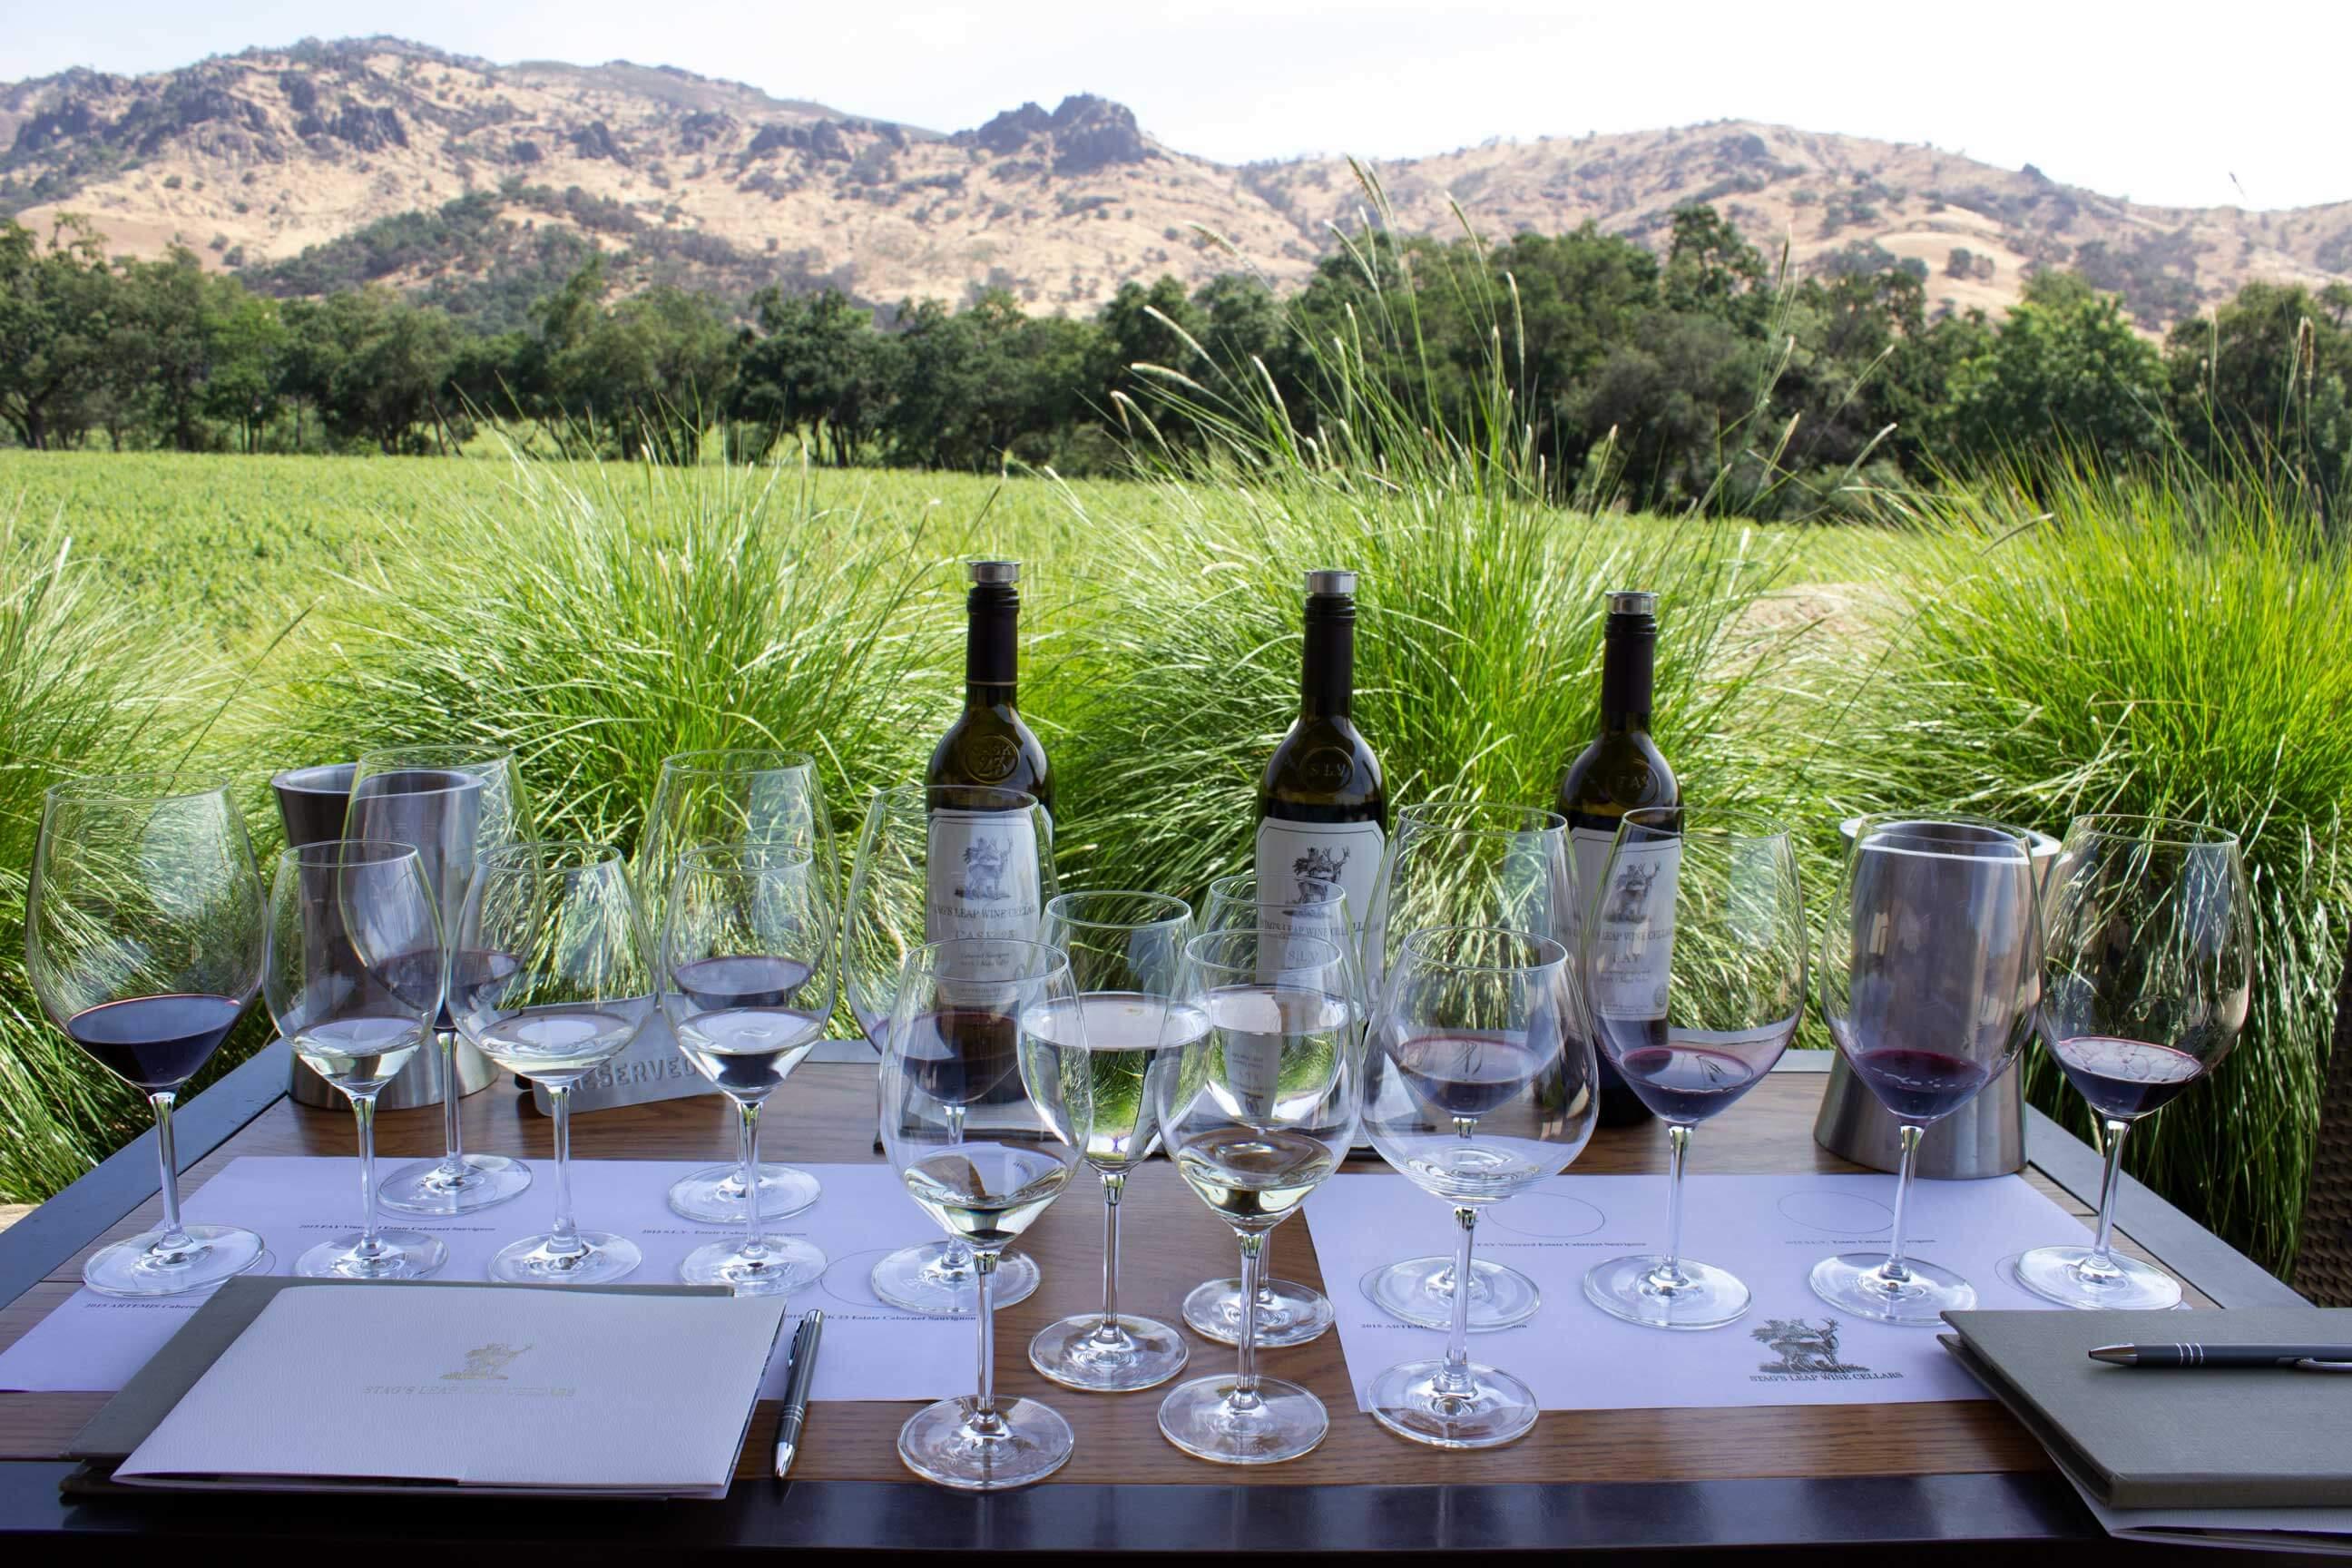 Stag's Leap Wine Cellars wine tasting